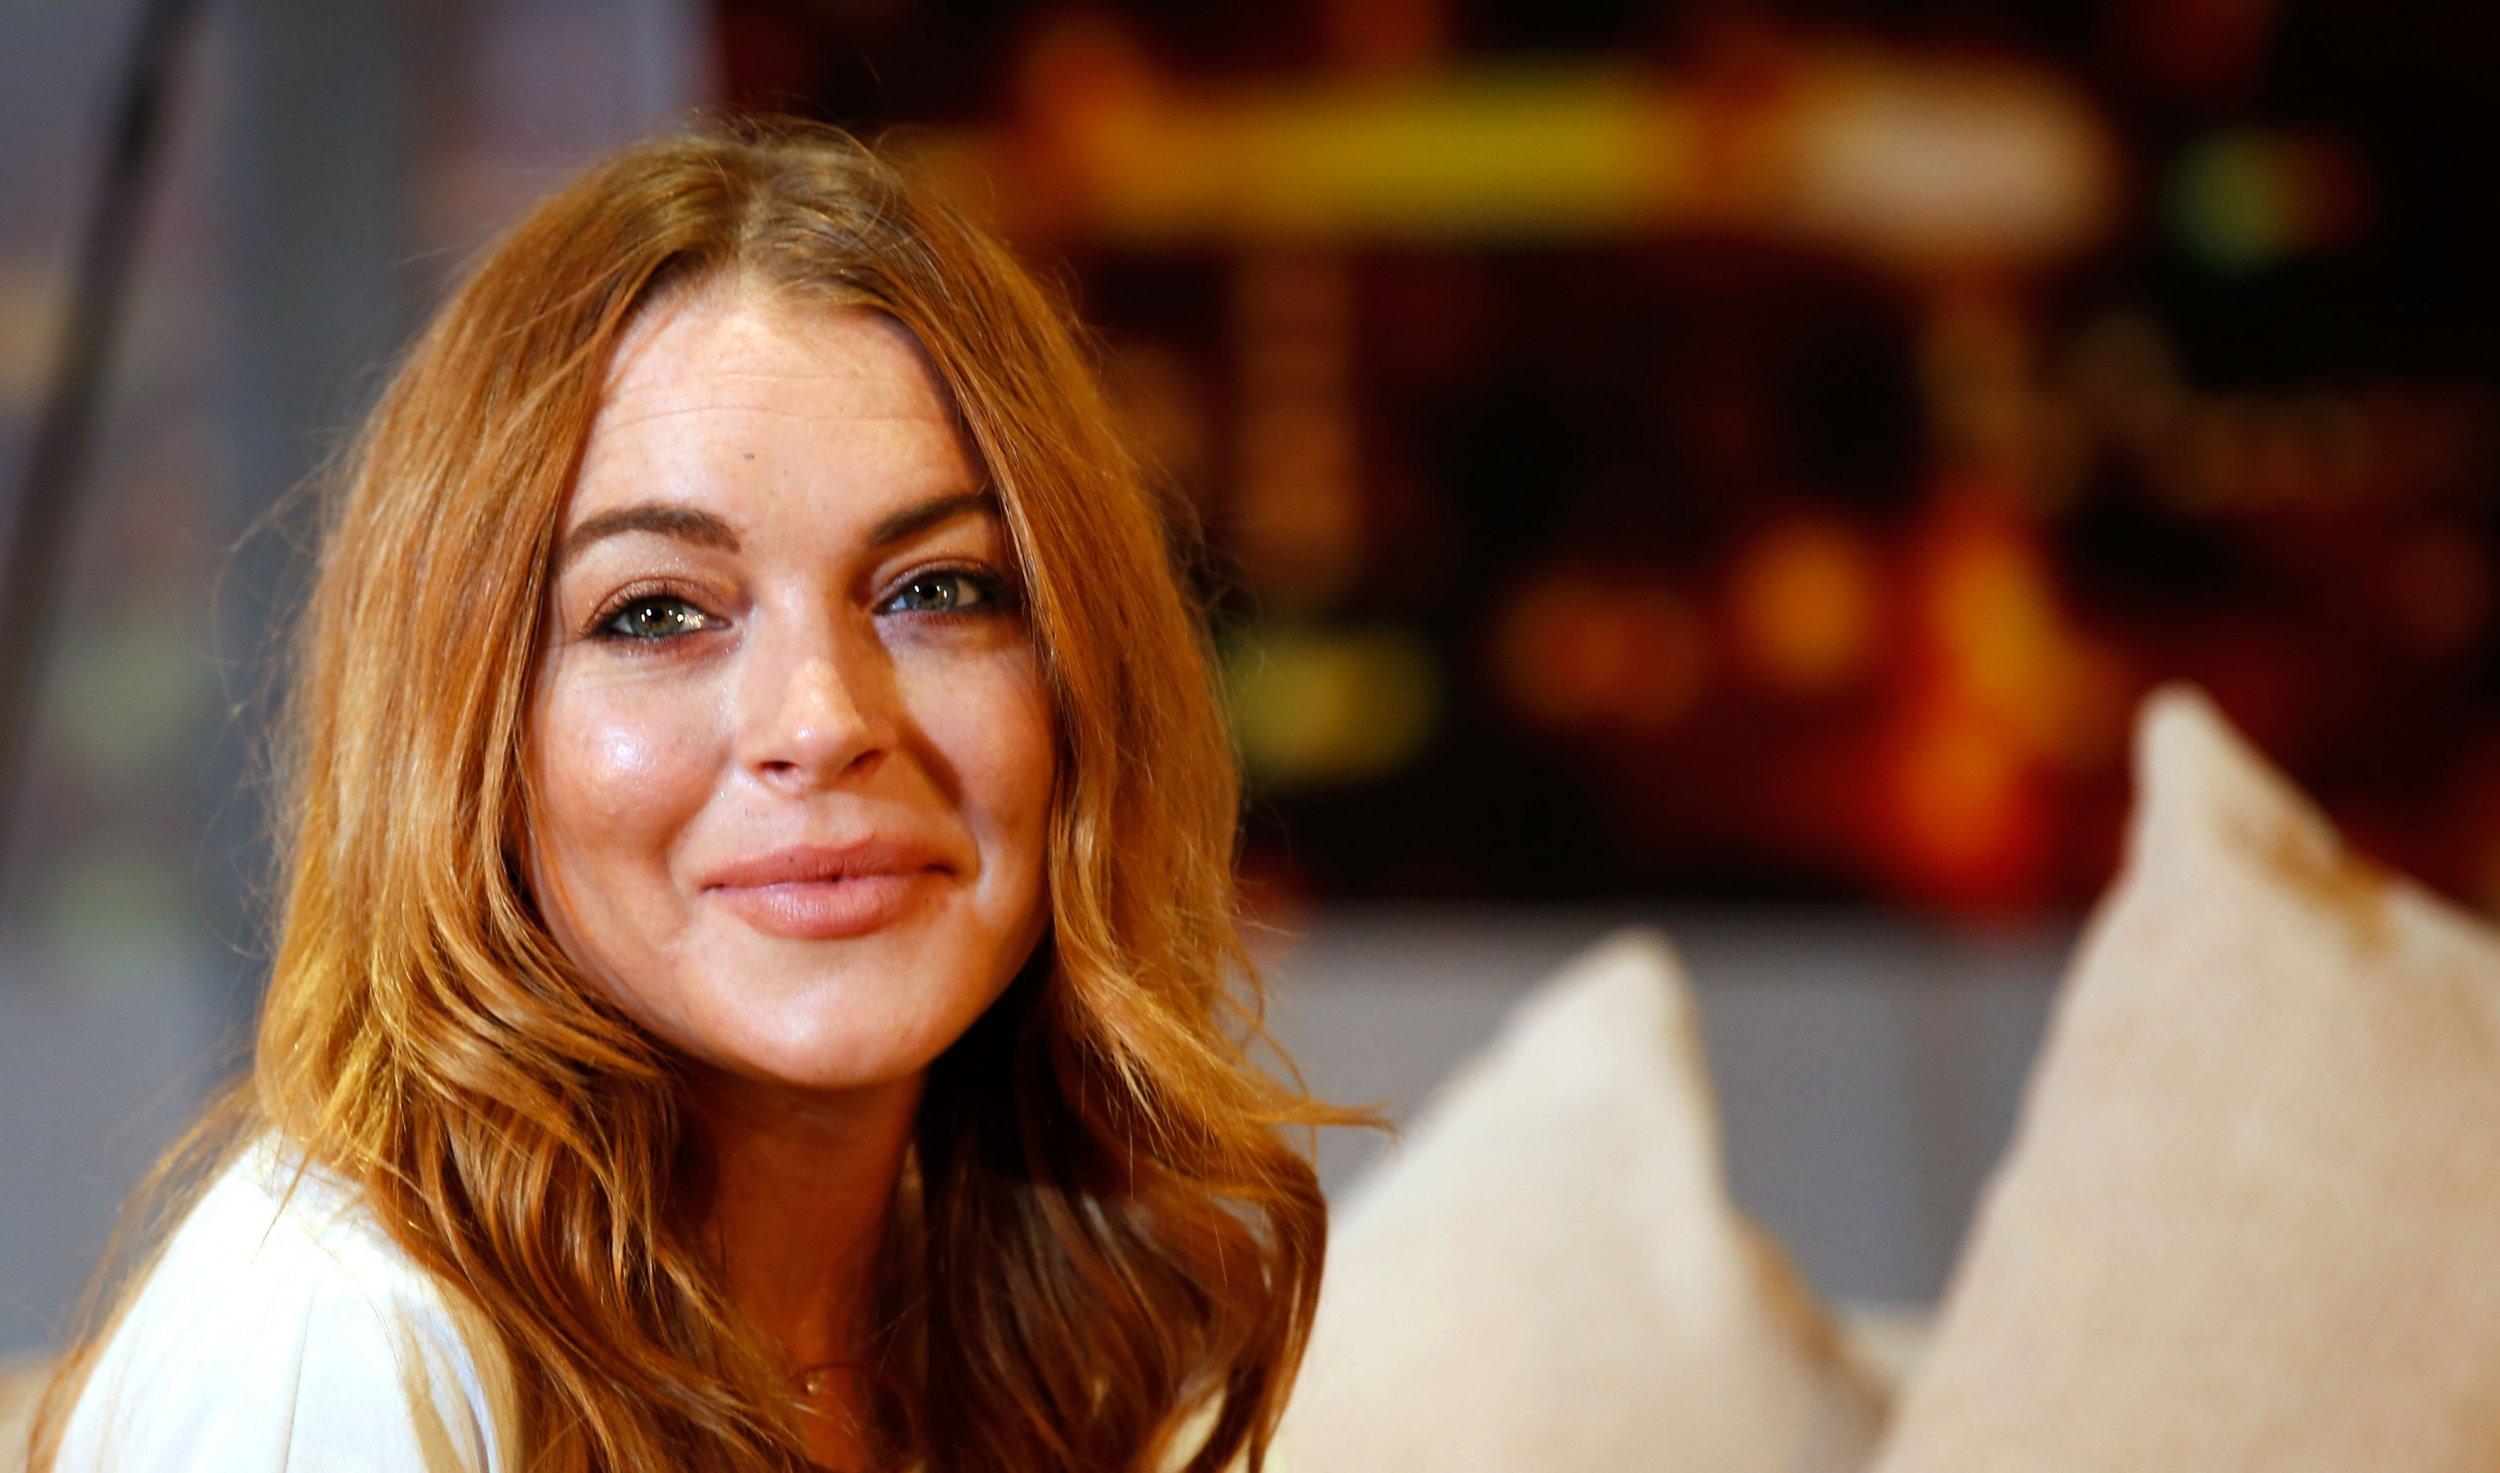 Lindsay Lohan: Stop bullying Donald Trump